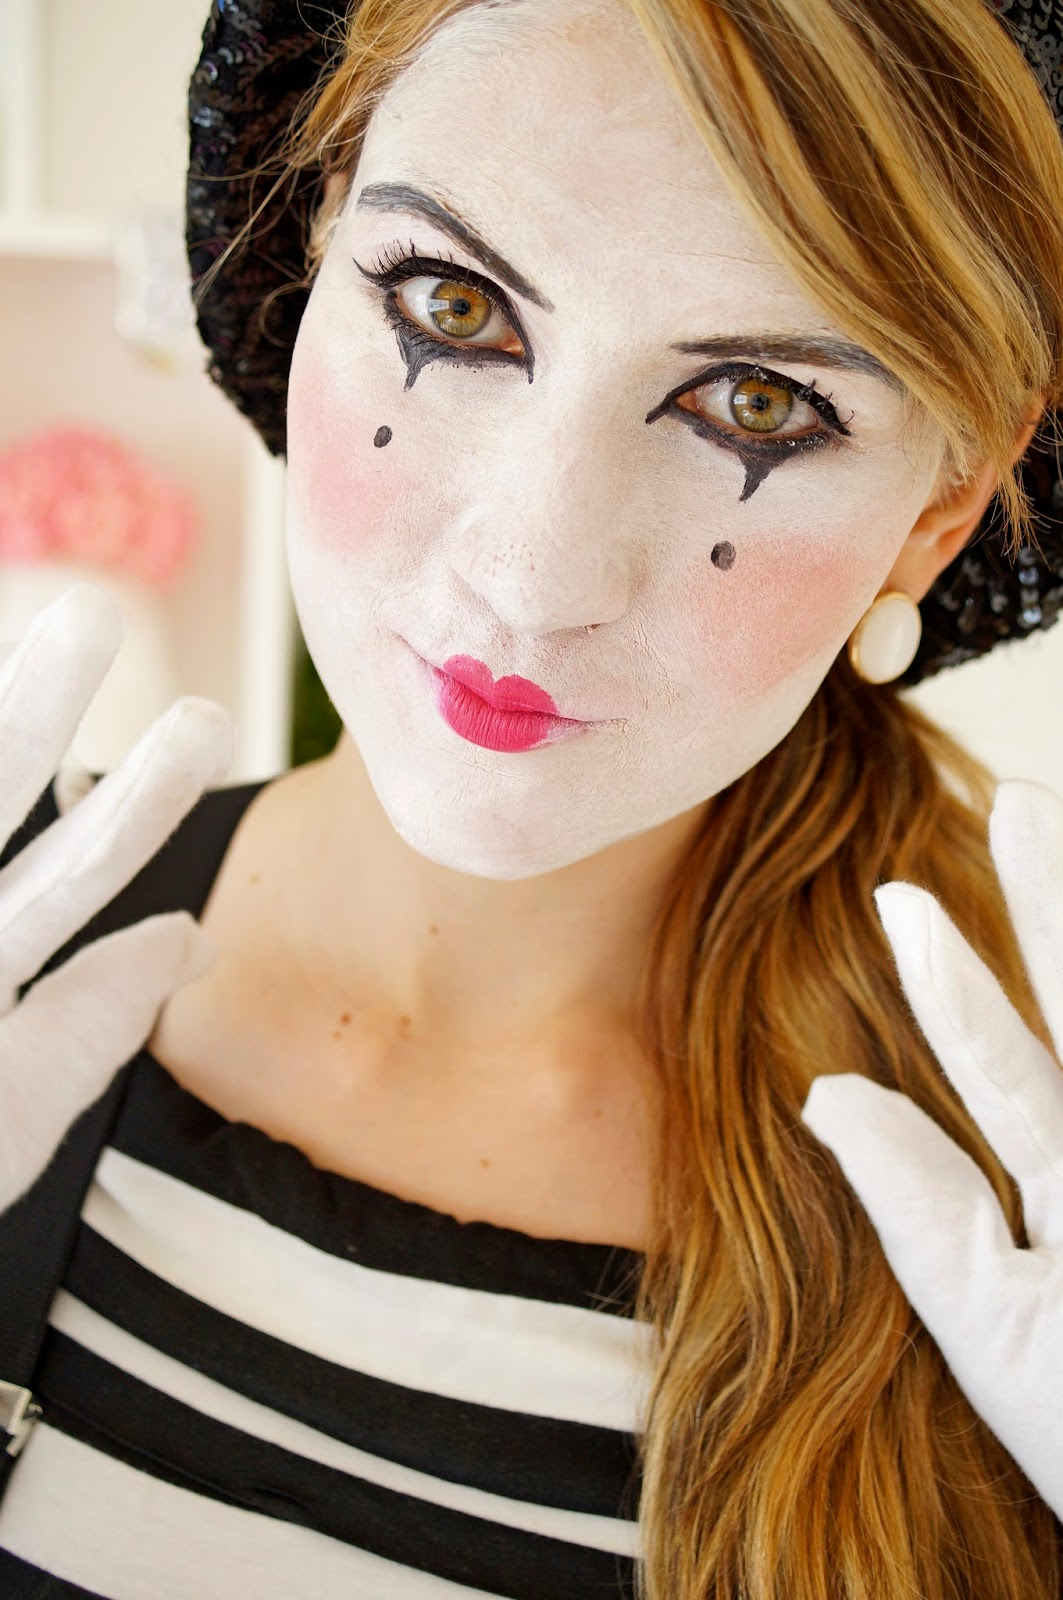 Easy Homemade Mime Costume Tutorial for Halloween